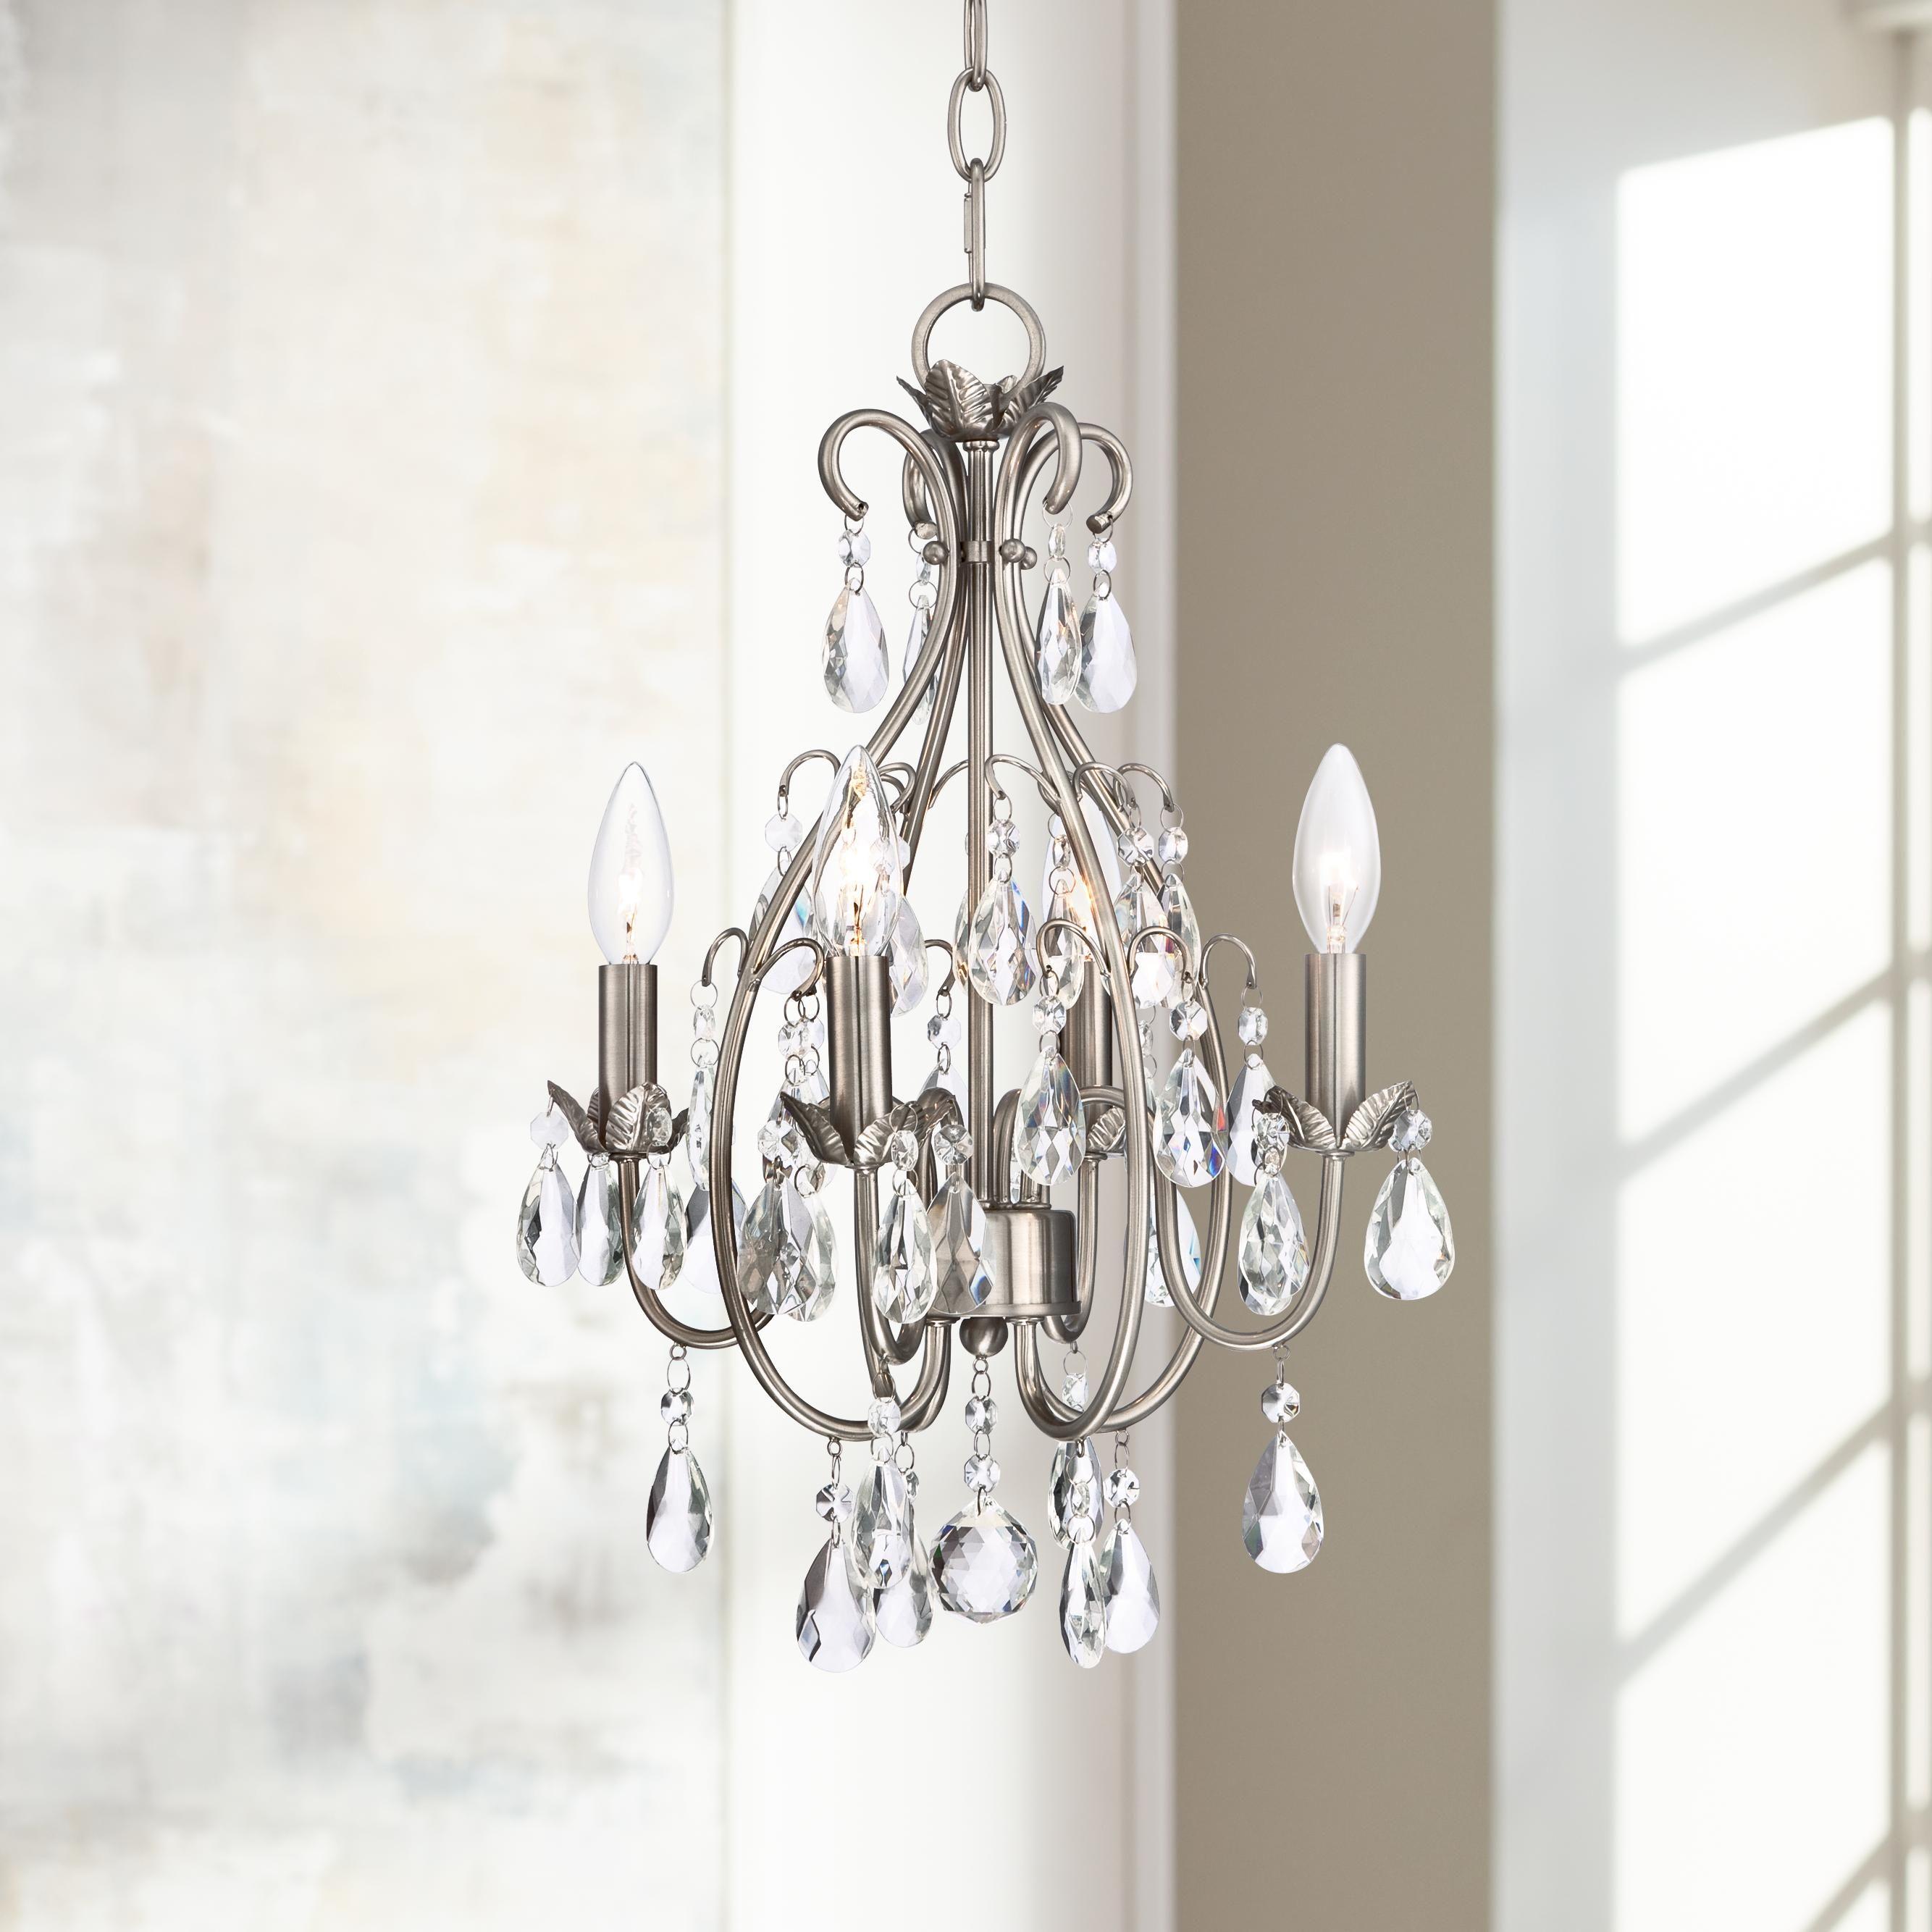 Kathy ireland hollis 15 wide crystal swag chandelier kathy kathy ireland hollis 15 wide crystal swag chandelier arubaitofo Gallery